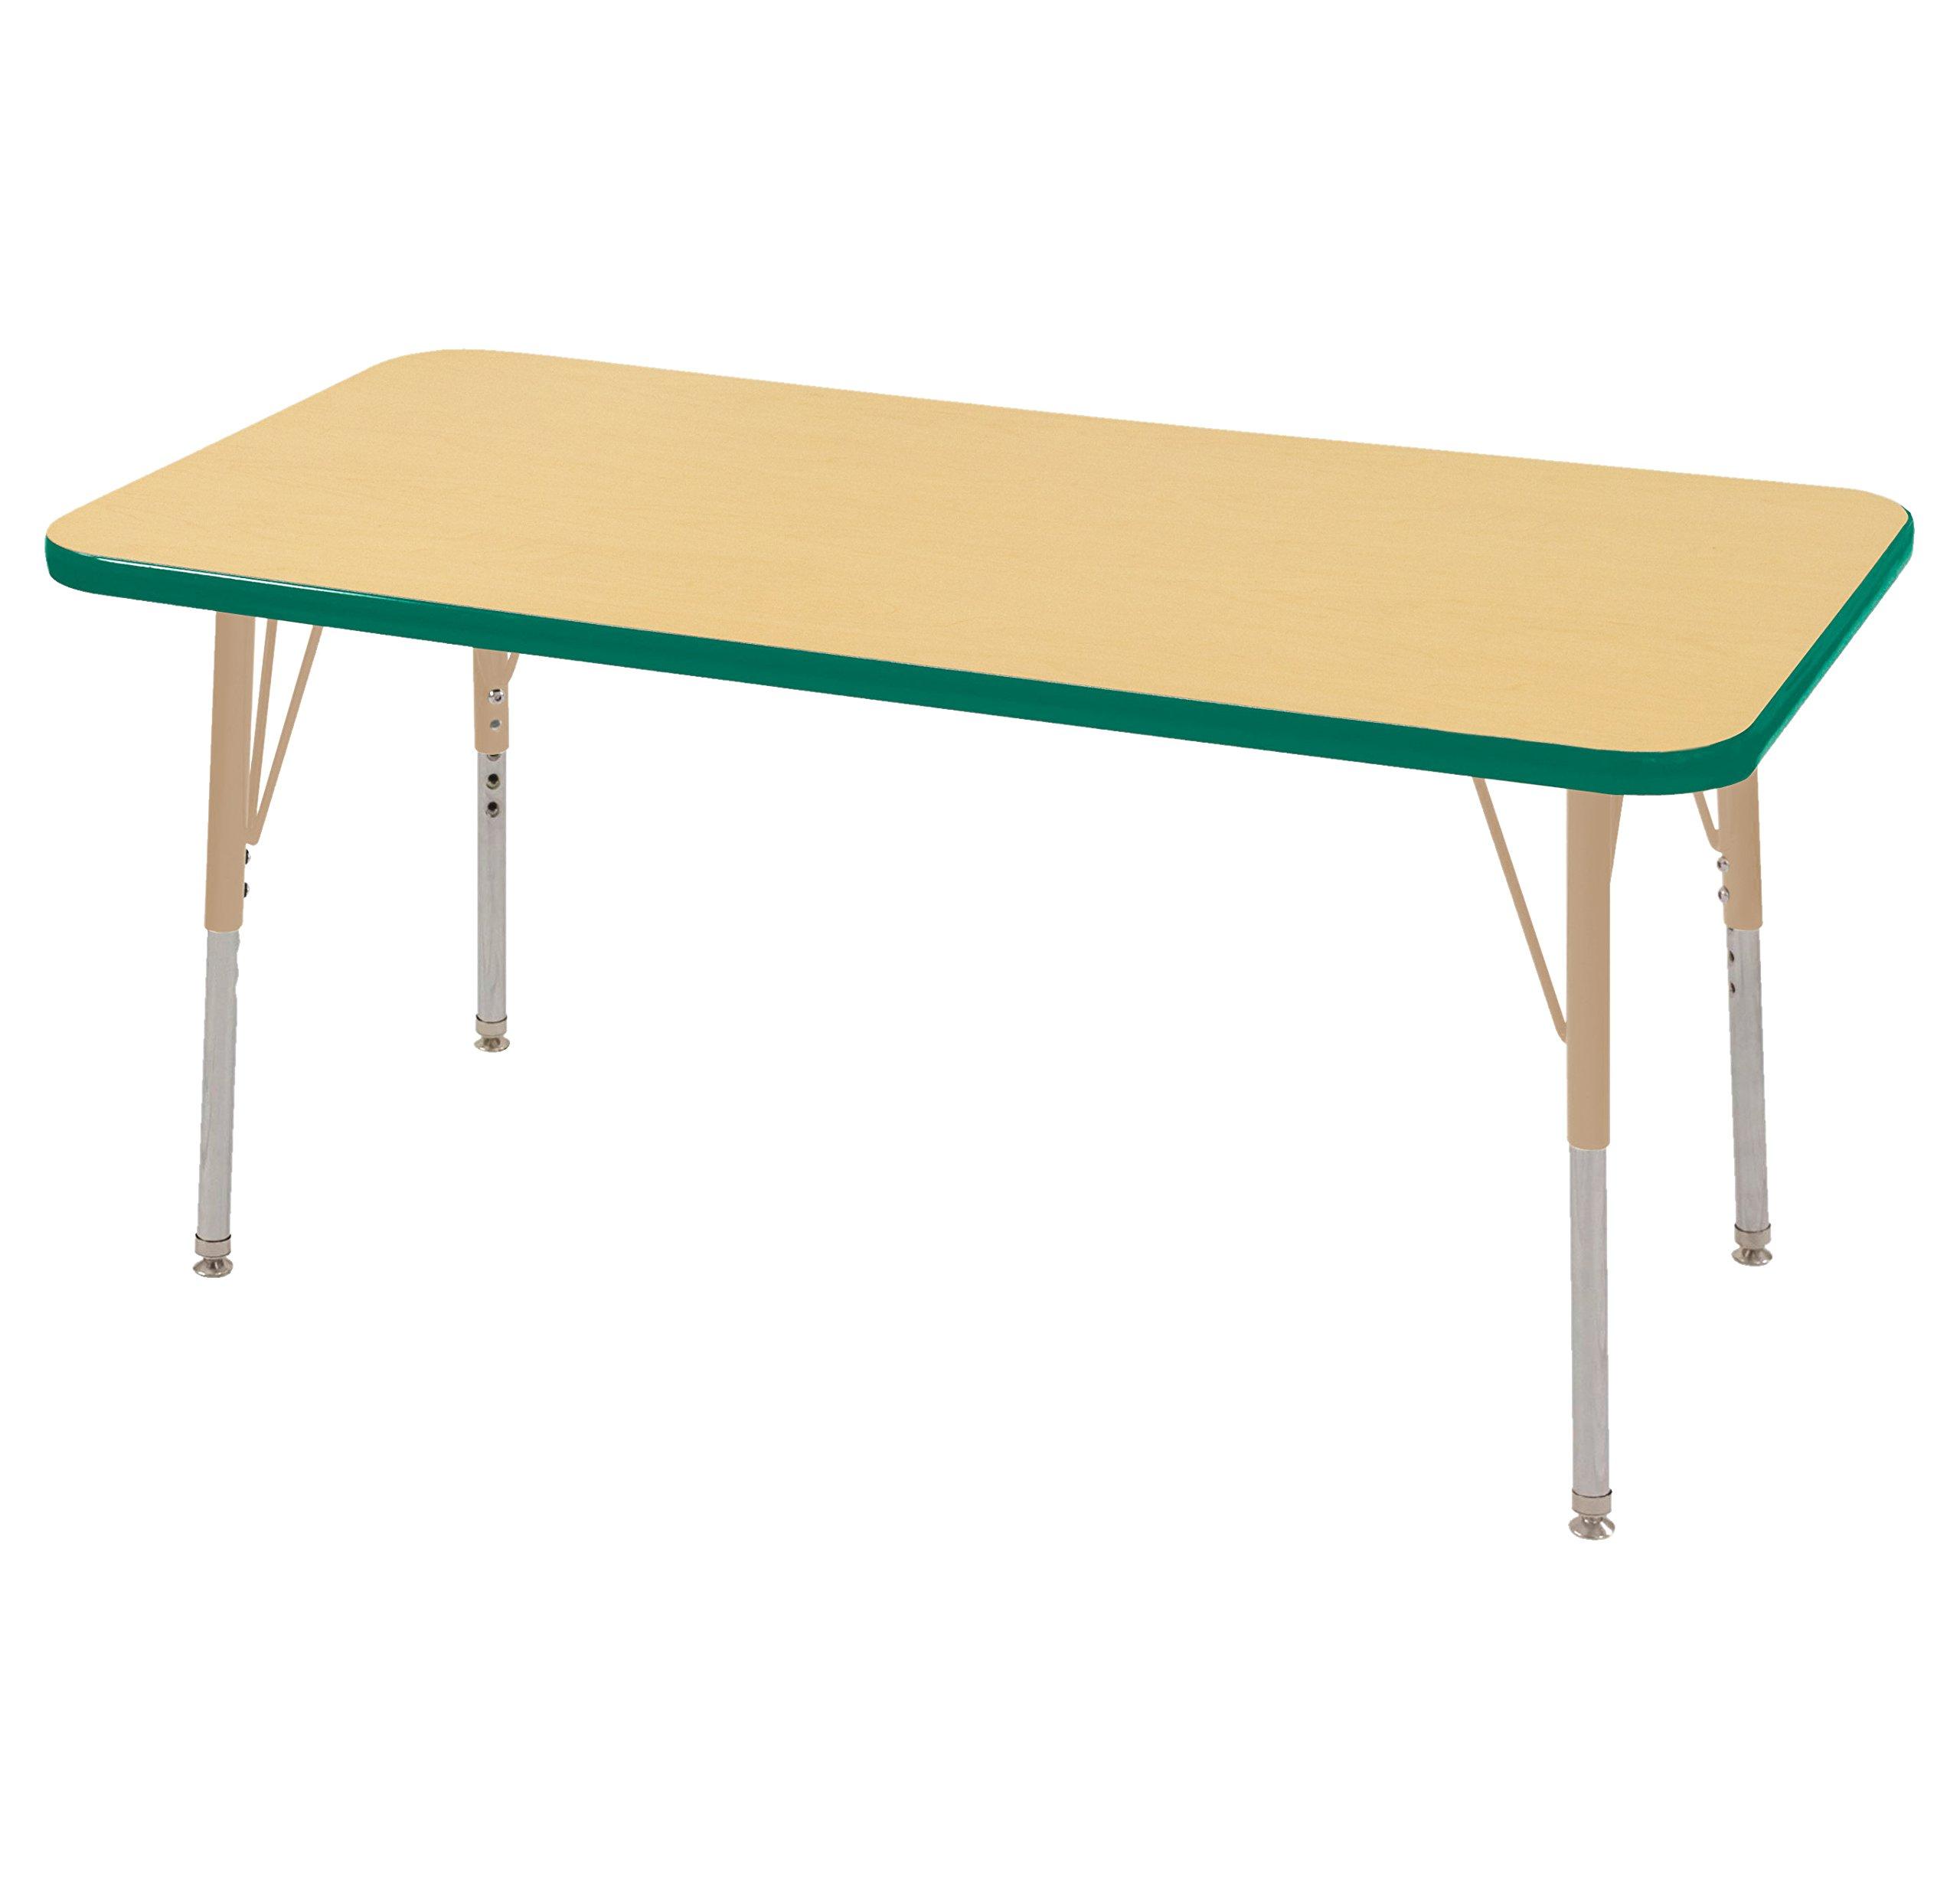 ECR4Kids Mesa T-Mold 24'' x 48'' Rectangular School Activity Table, Standard Legs w/ Swivel Glides, Adjustable Height 19-30 inch (Maple/Green/Sand)